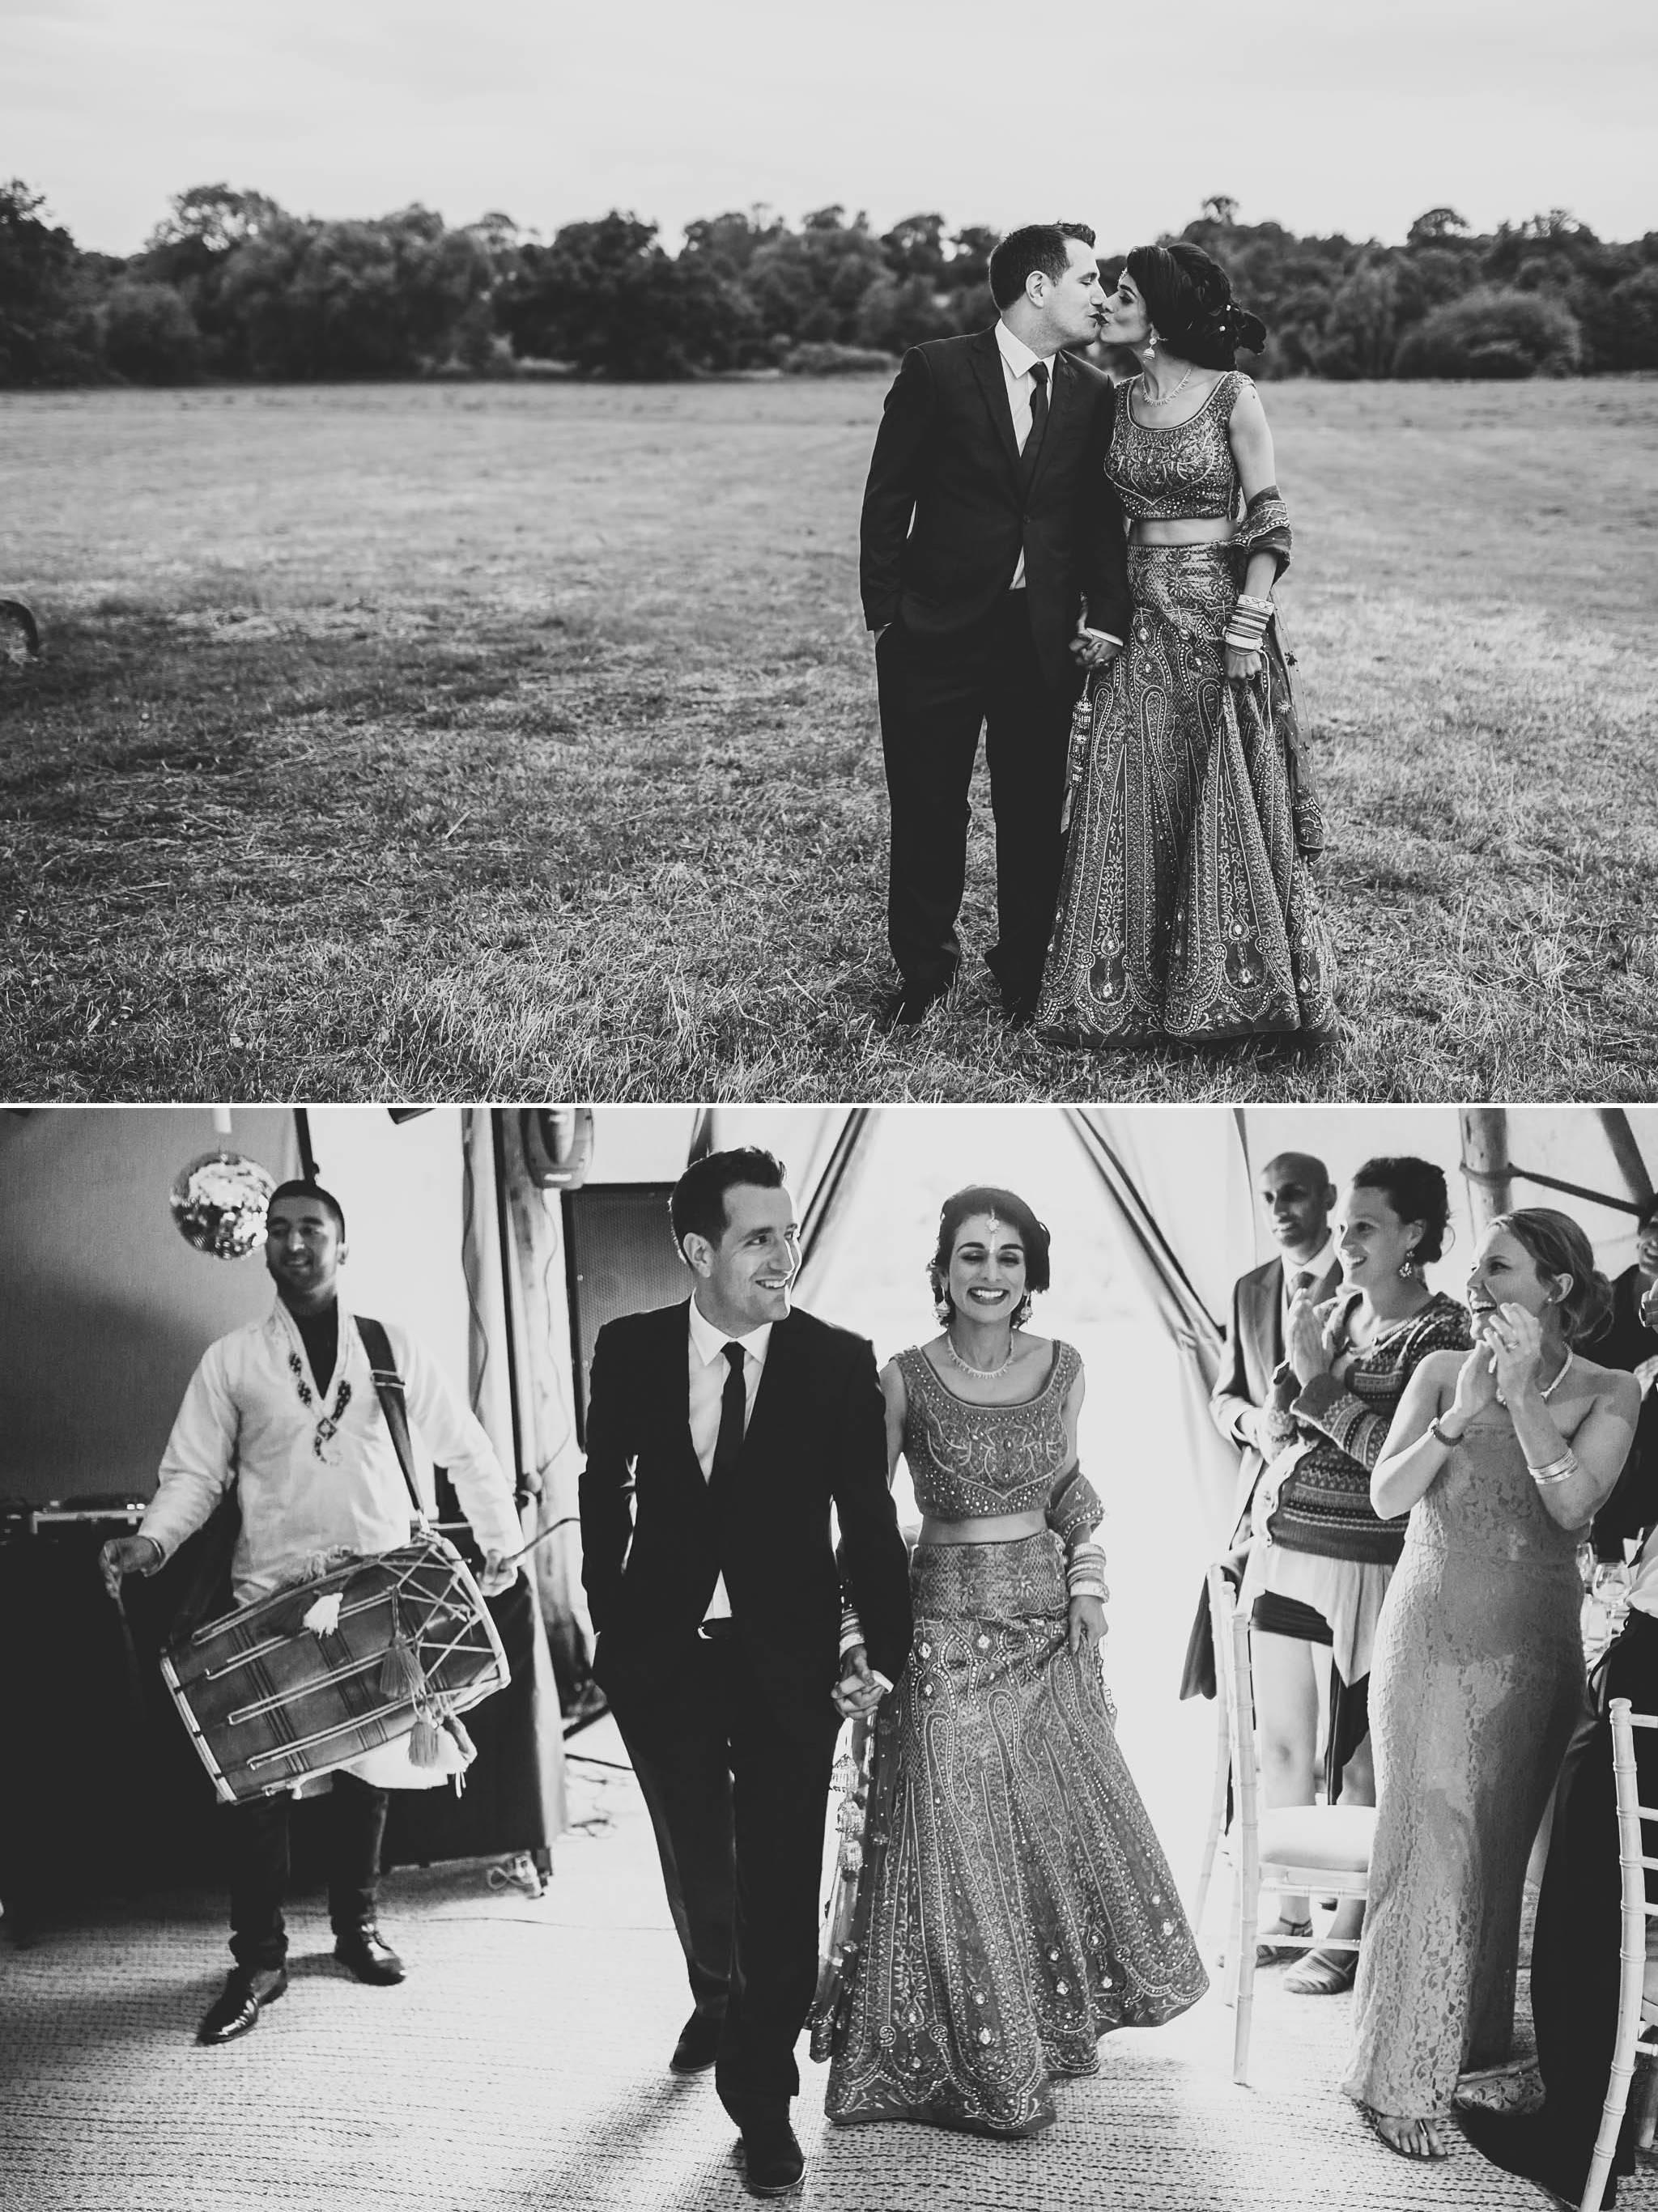 wedding-photographer-staffordshire 24.jpg